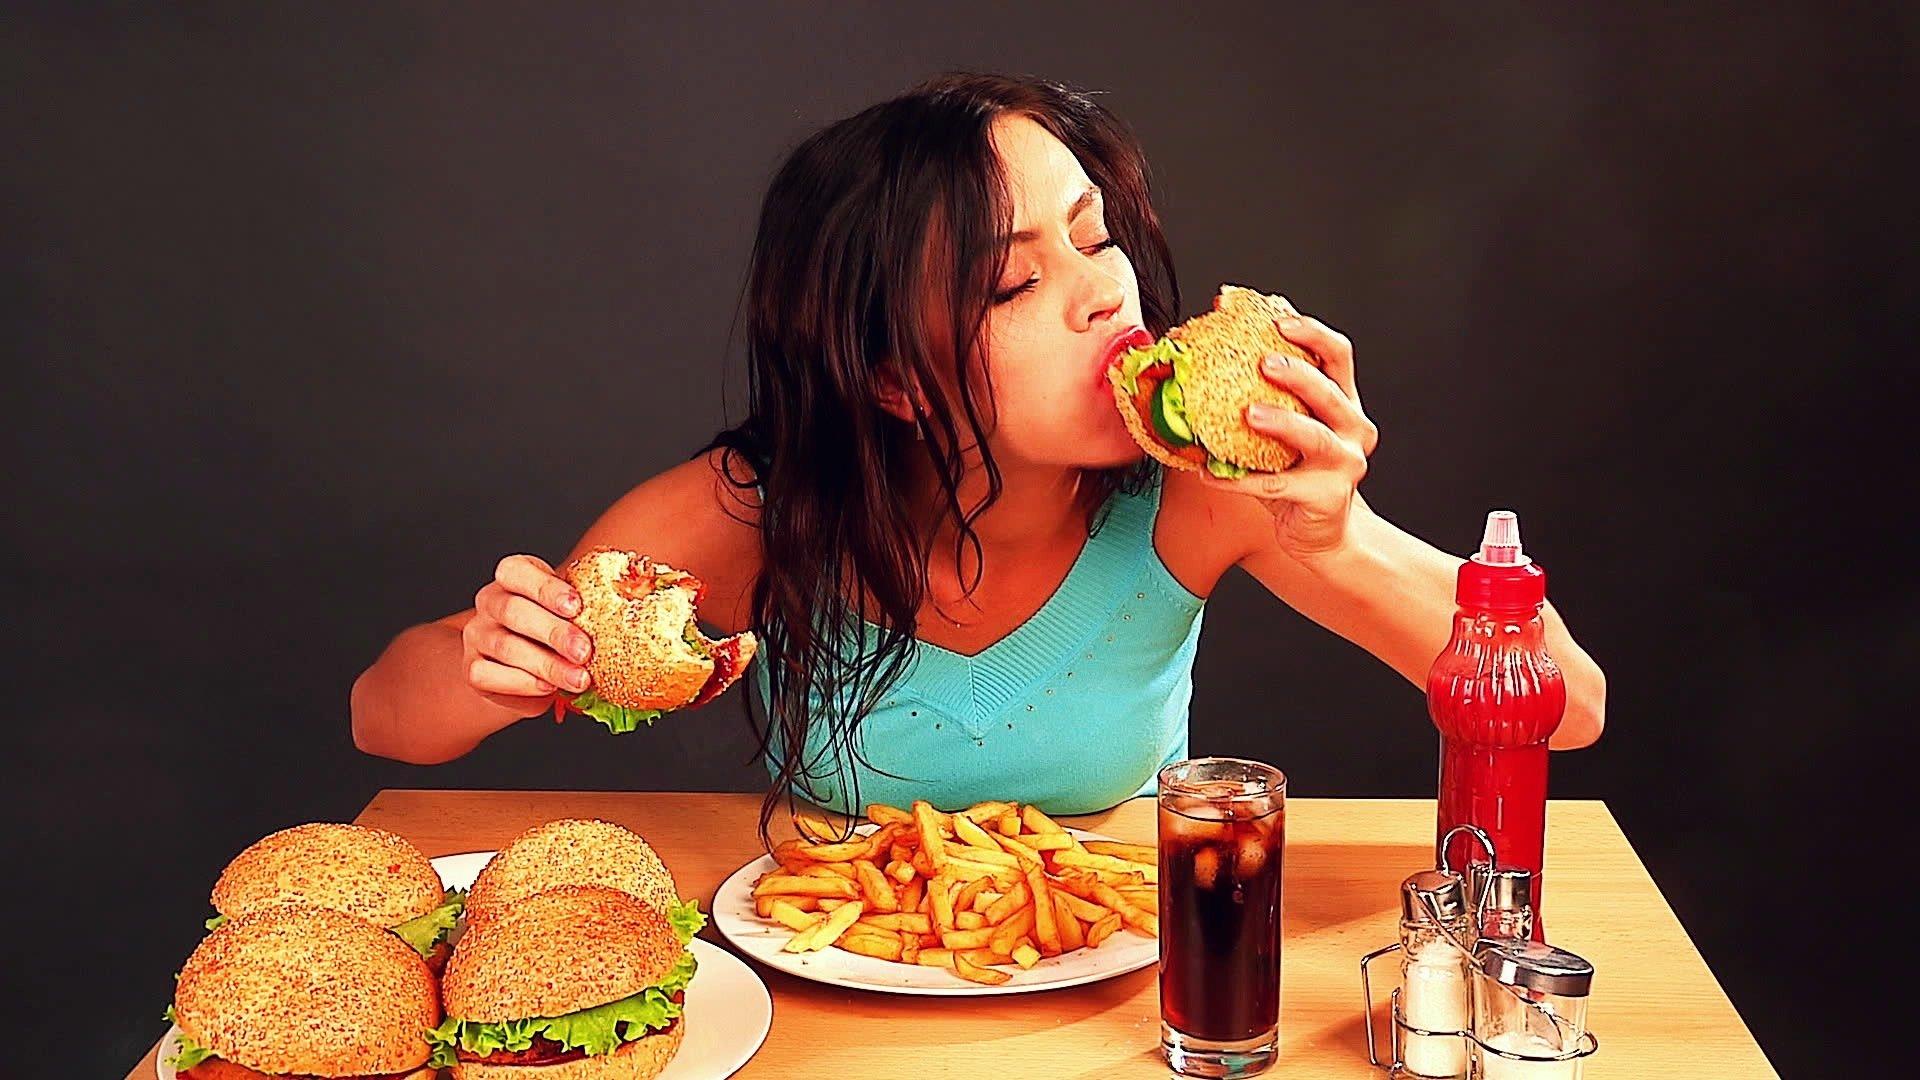 6 Dangerous Foods You Should Never Eat